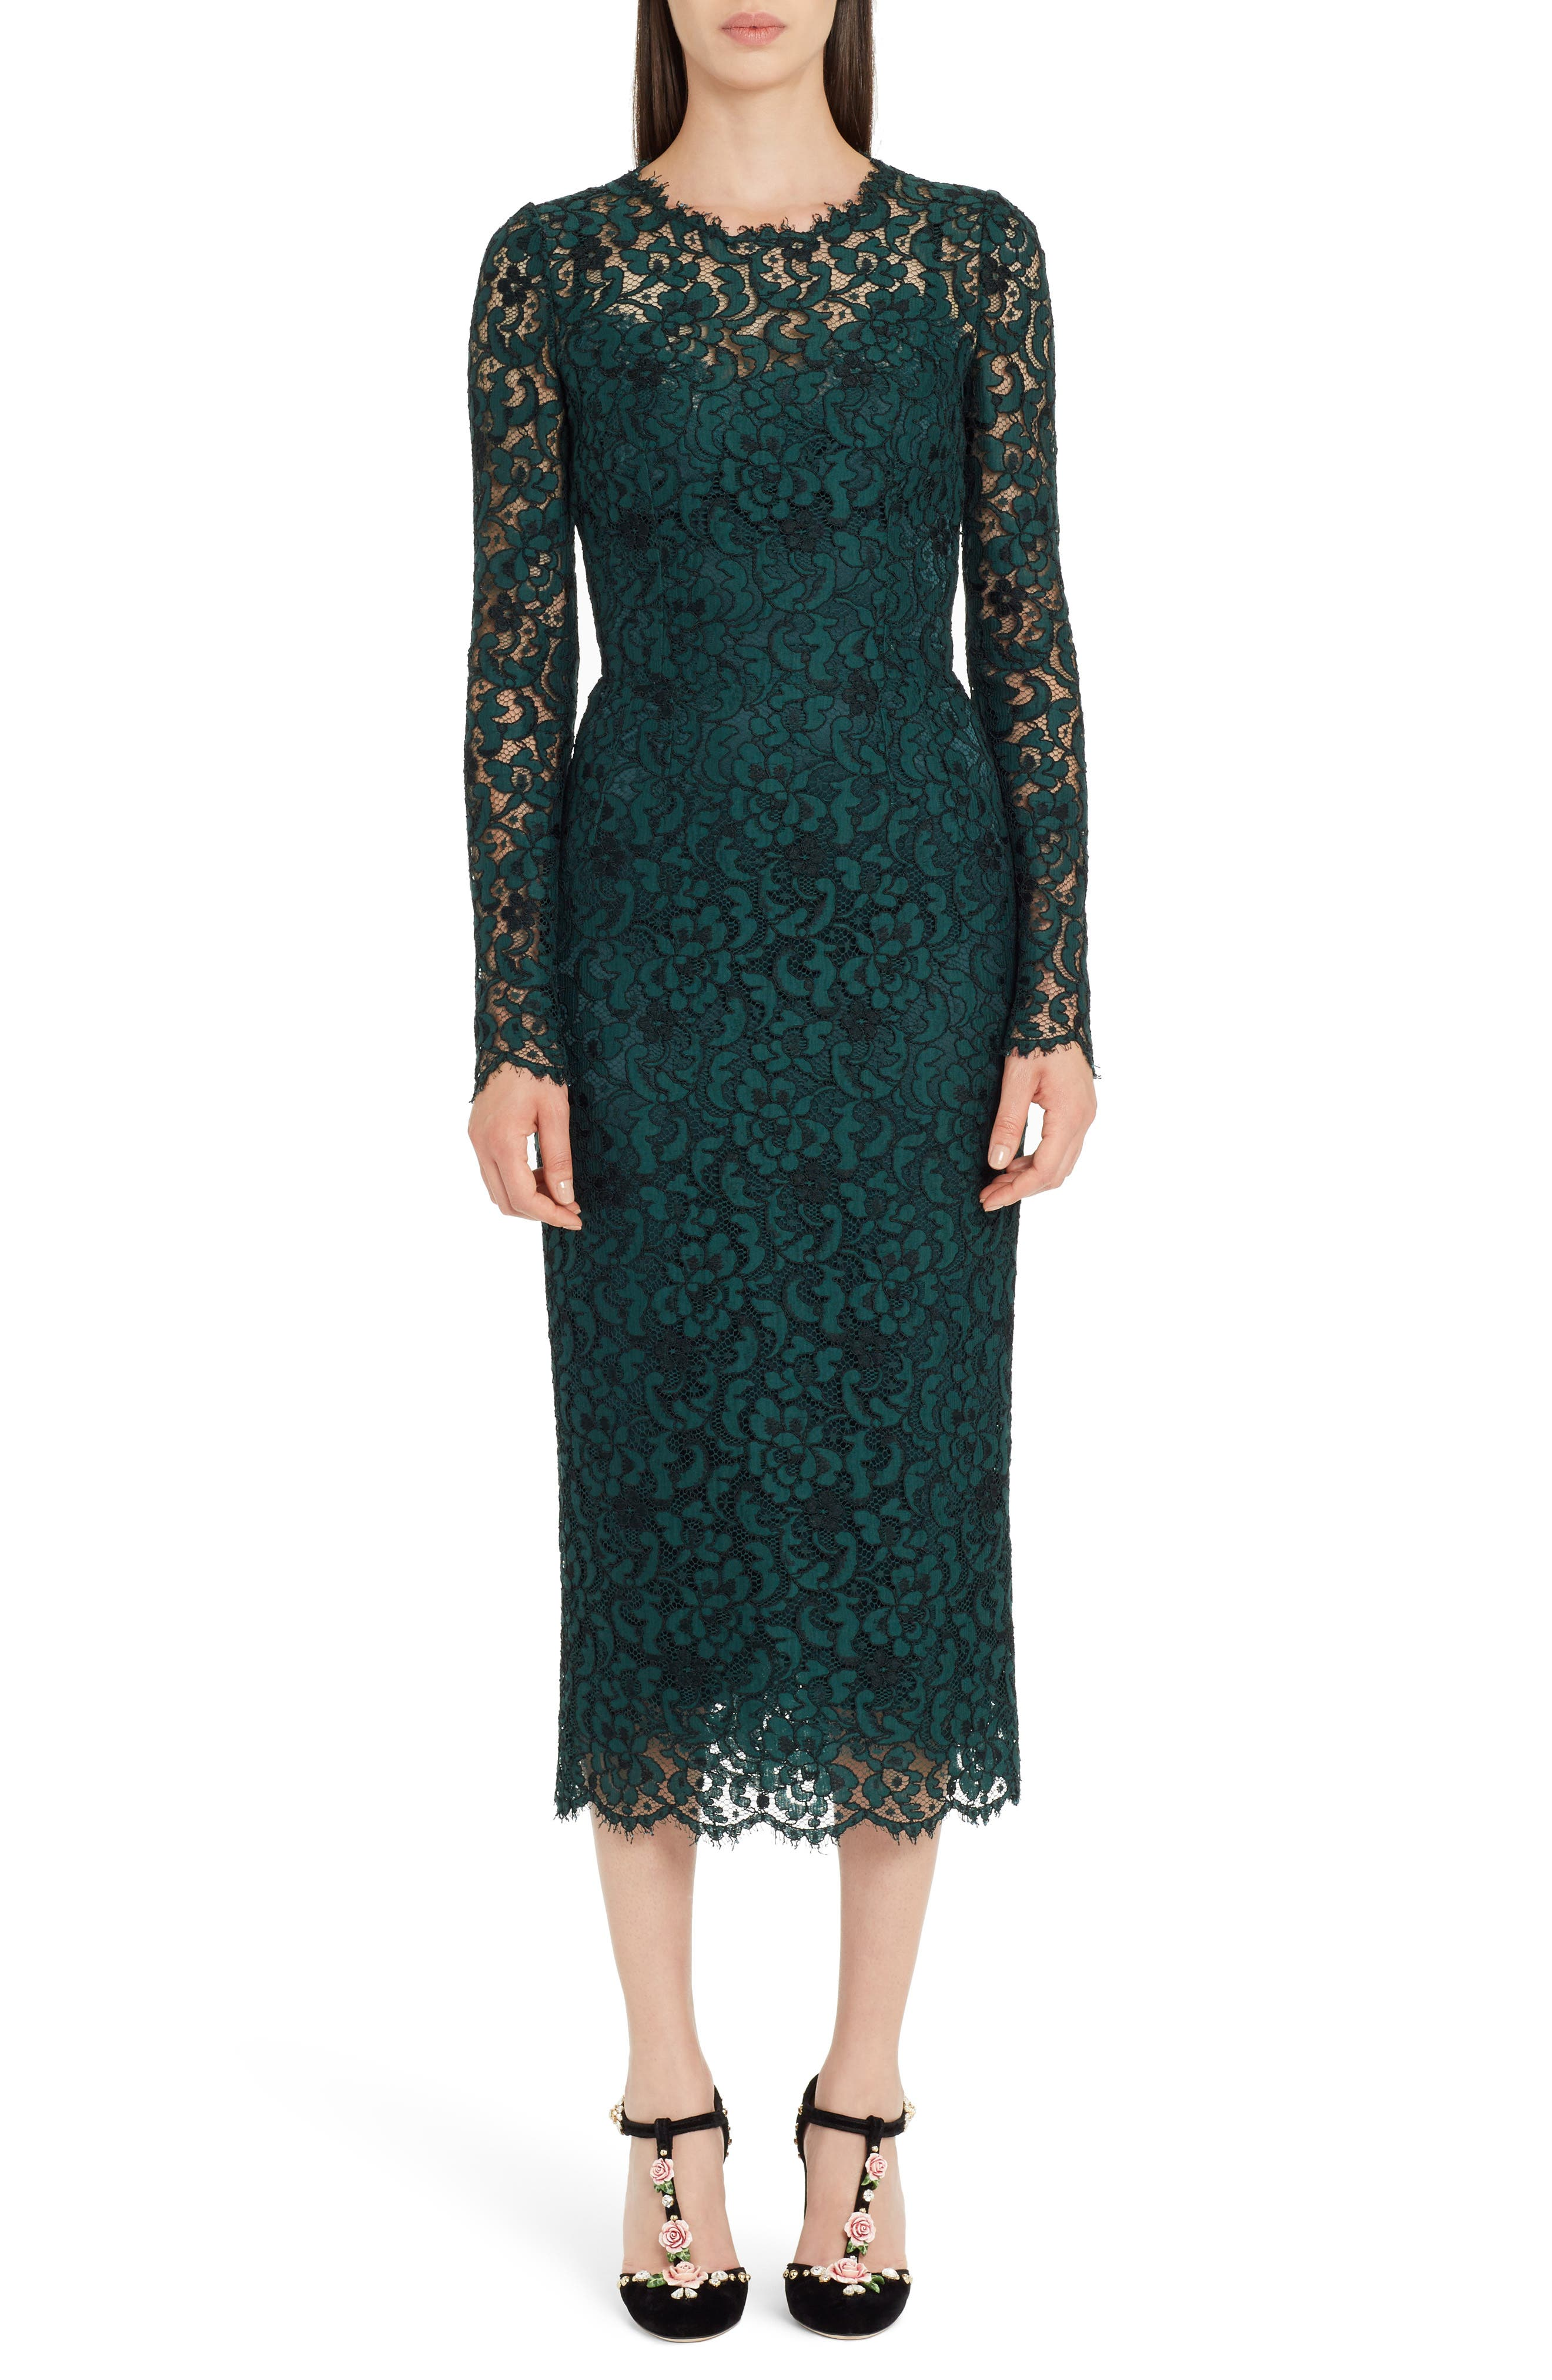 Dolce & gabbana Lace Pencil Dress, 8 IT - Green